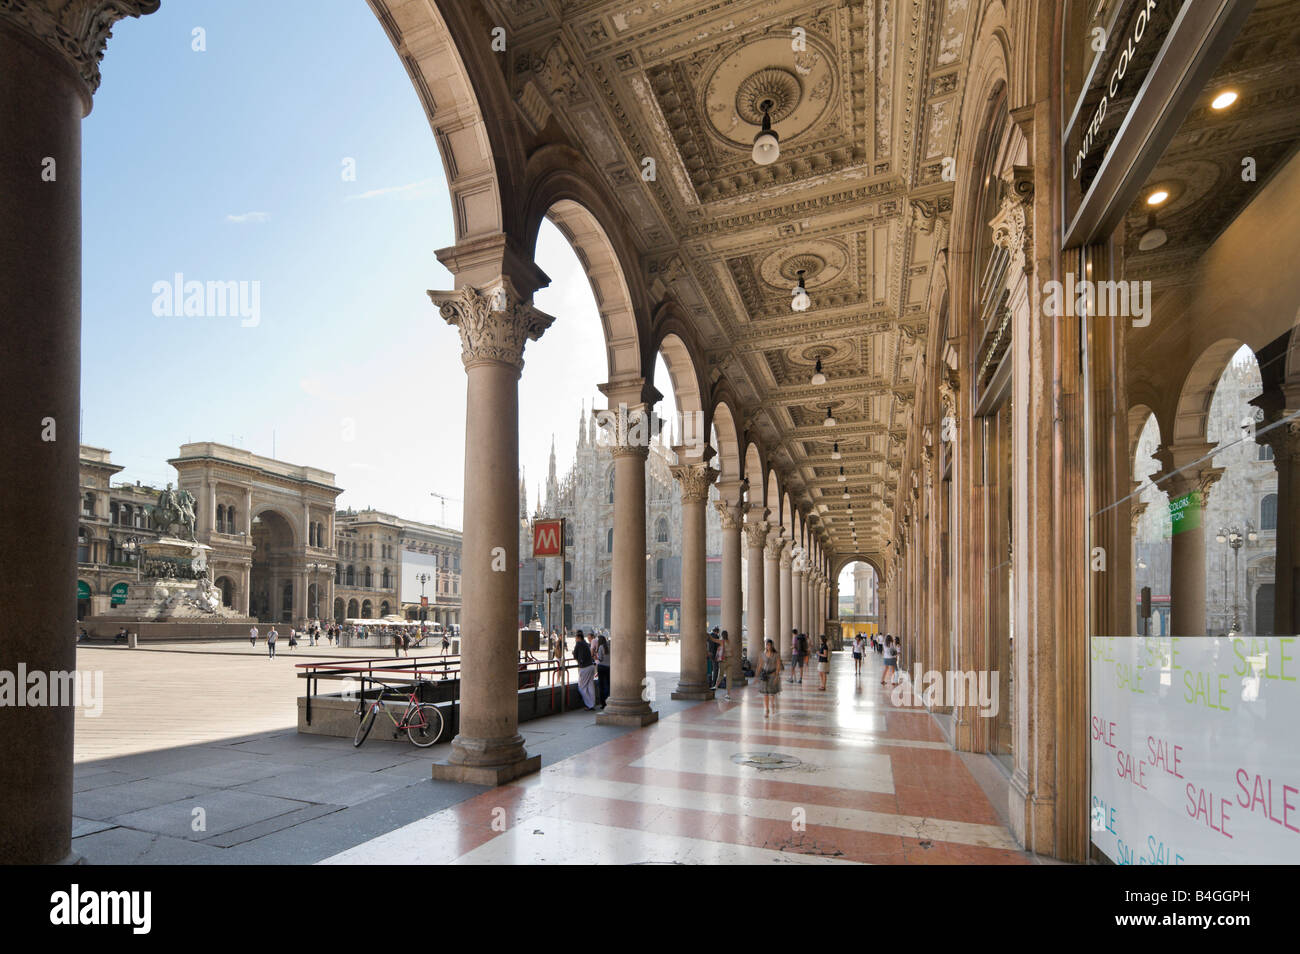 Shopping Arcade donnant sur la cathédrale et la galerie Vittorio Emanuele II, Piazza del Duomo, Milan, Lombardie, Photo Stock